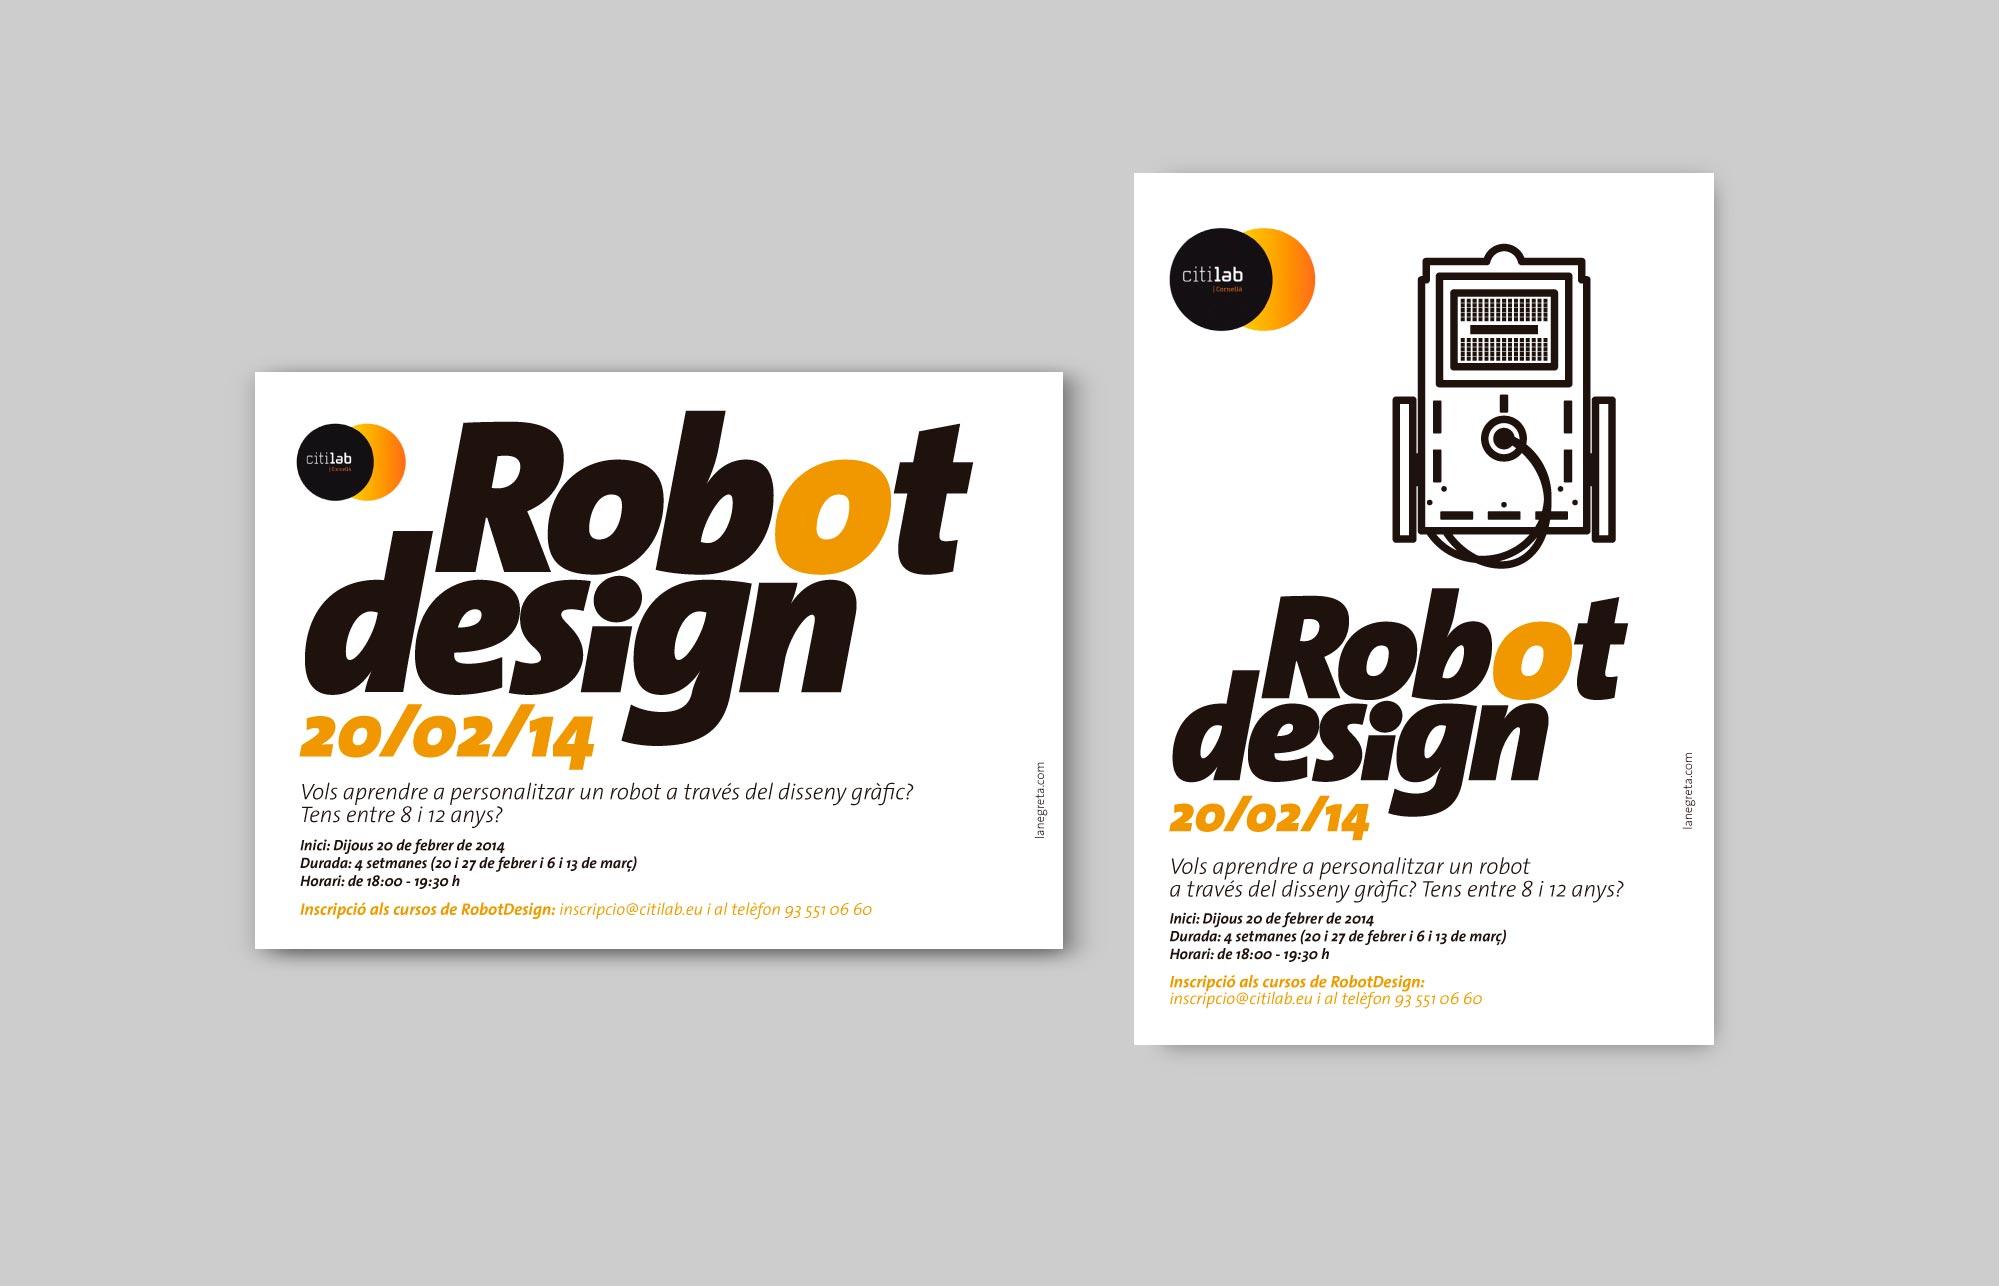 CITILAB-ROBOTDESIGN-2.jpg